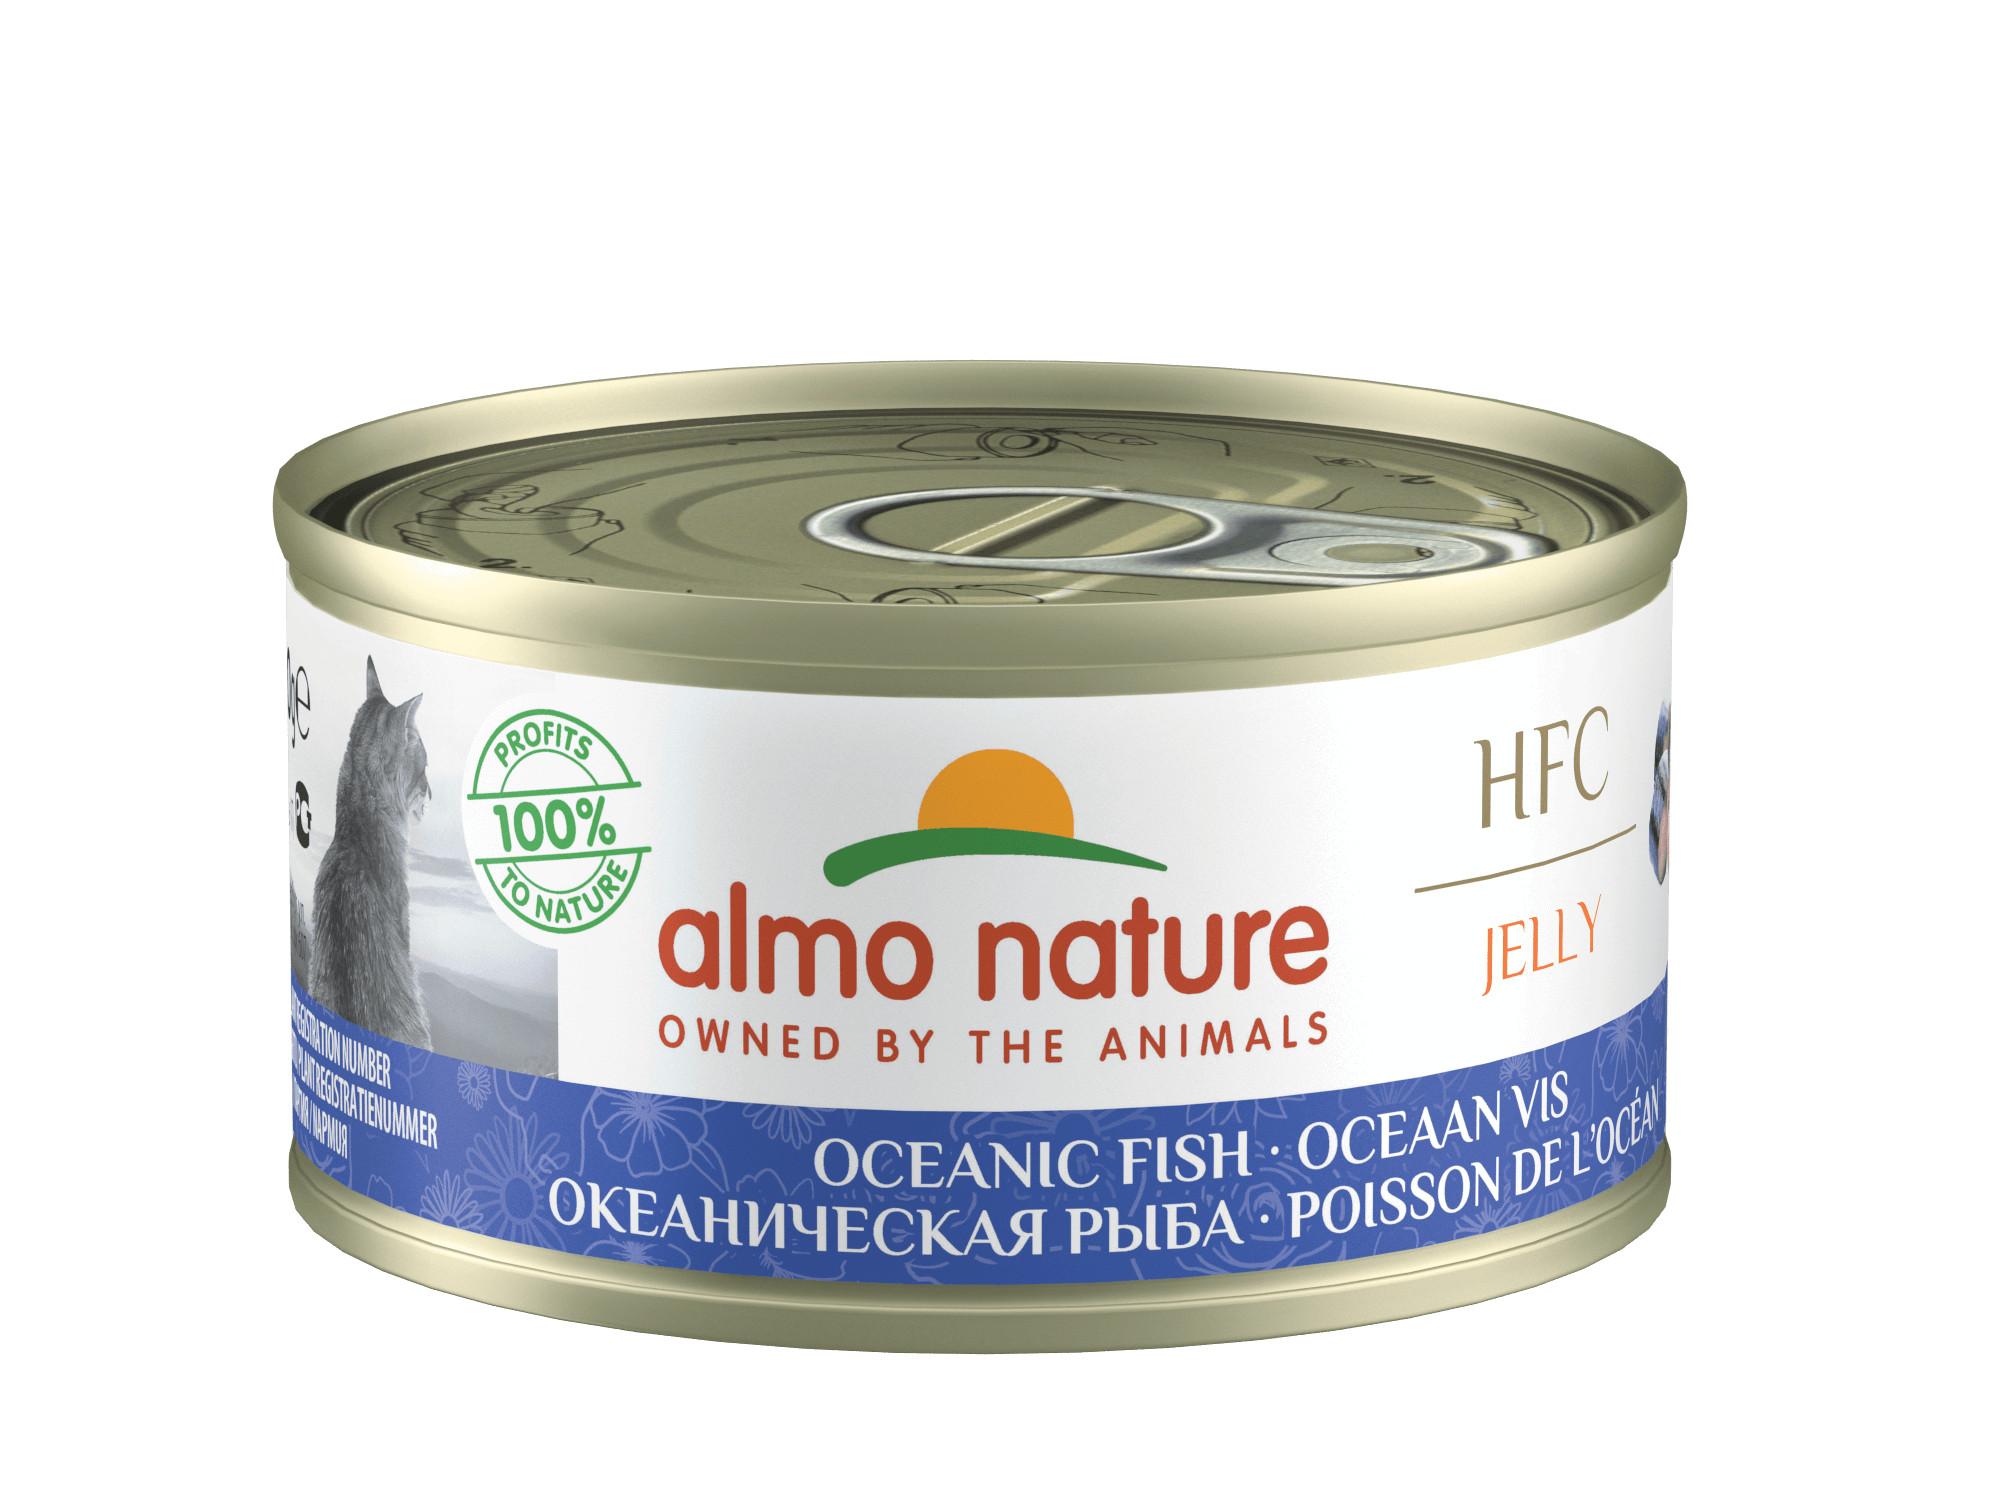 Almo Nature HFC Jelly Oceaanvis 70 gr